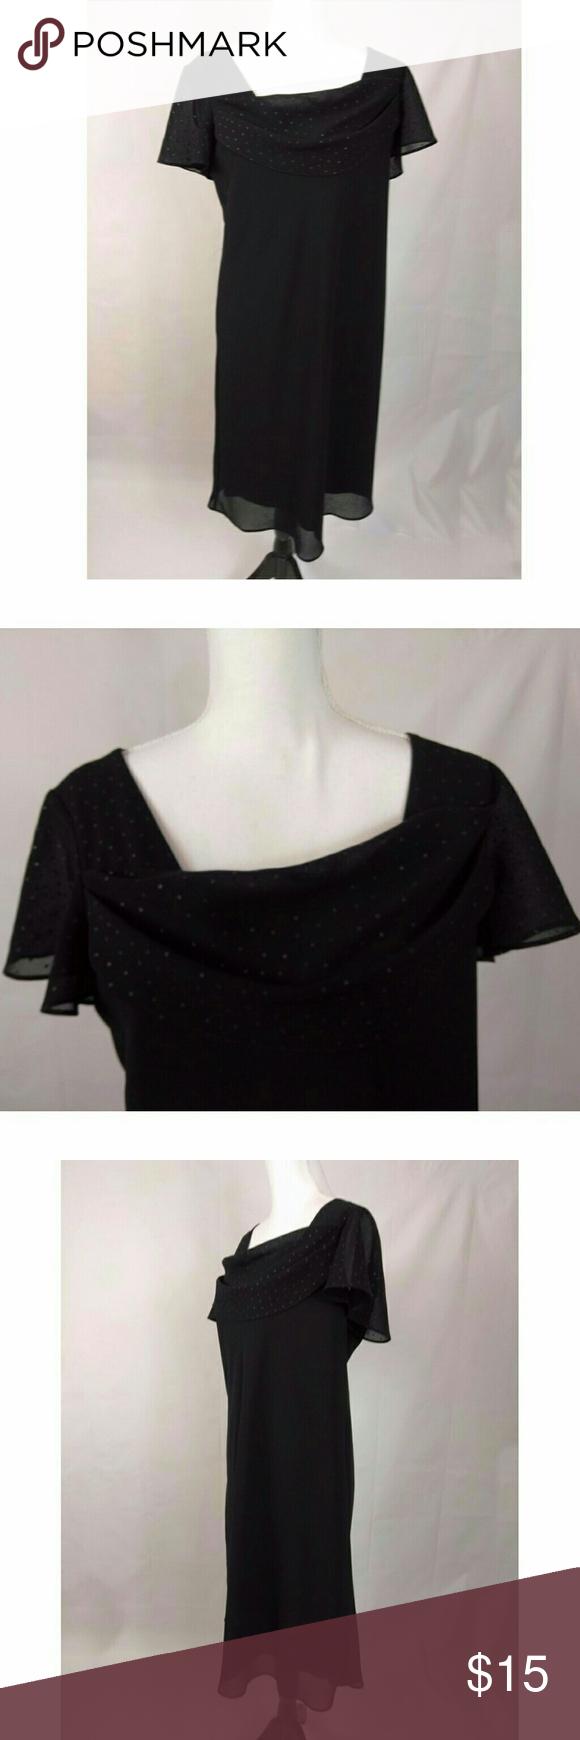 Cato Little Black Dress Size 14 You Are Buying Cato Women S Dress Size 14 Black Little Black Dress Classic S Black Dress Size 14 Clothes Design Size 14 Dresses [ 1740 x 580 Pixel ]